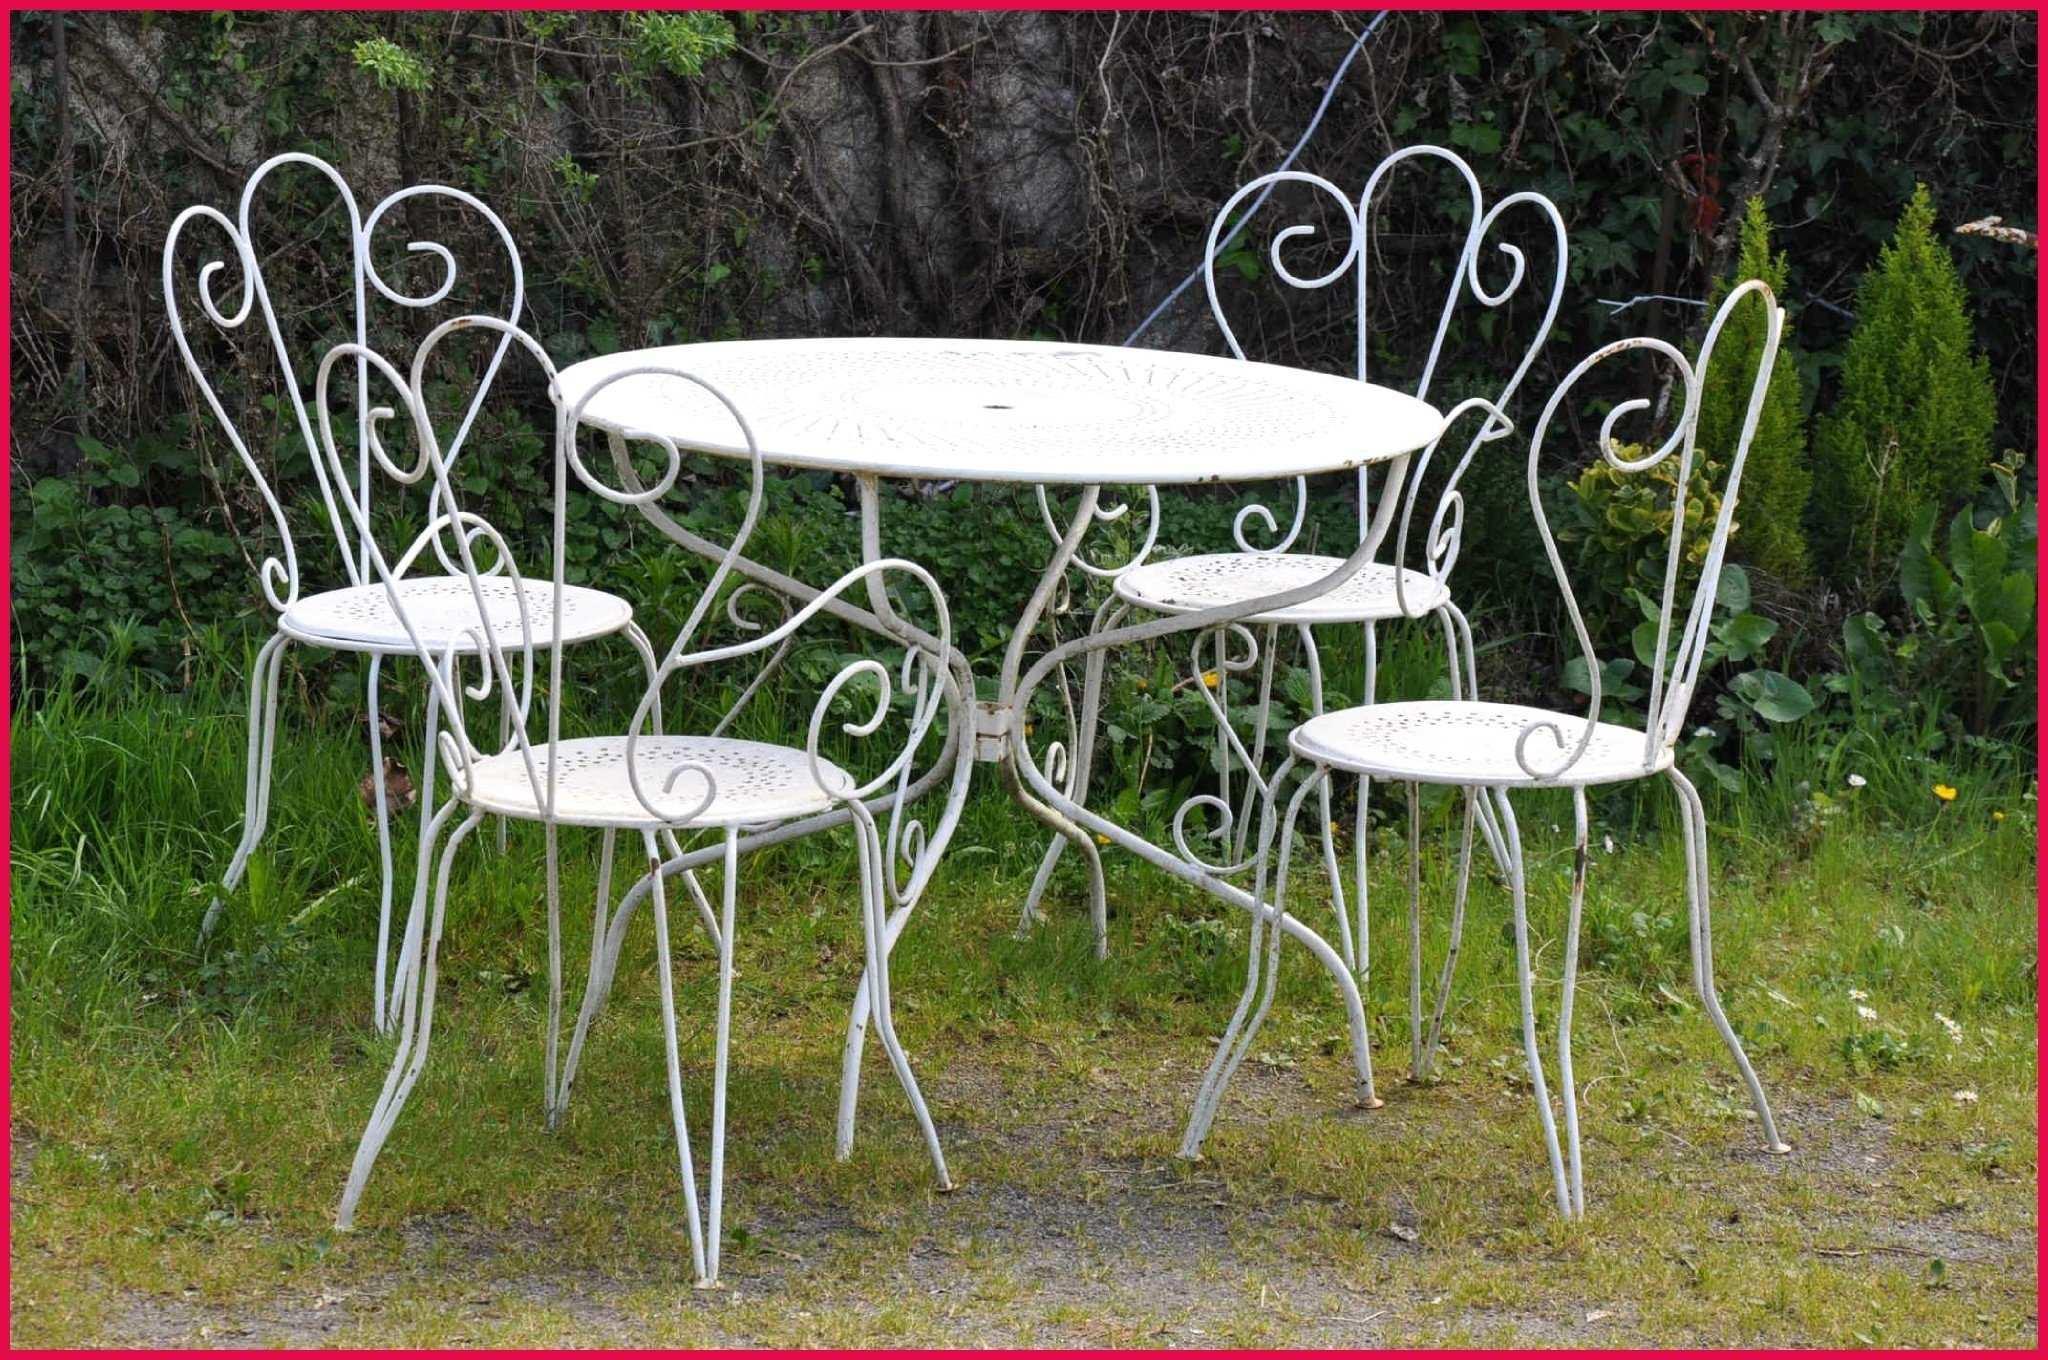 Salon de jardin en fer romantique - Abri de jardin et ...